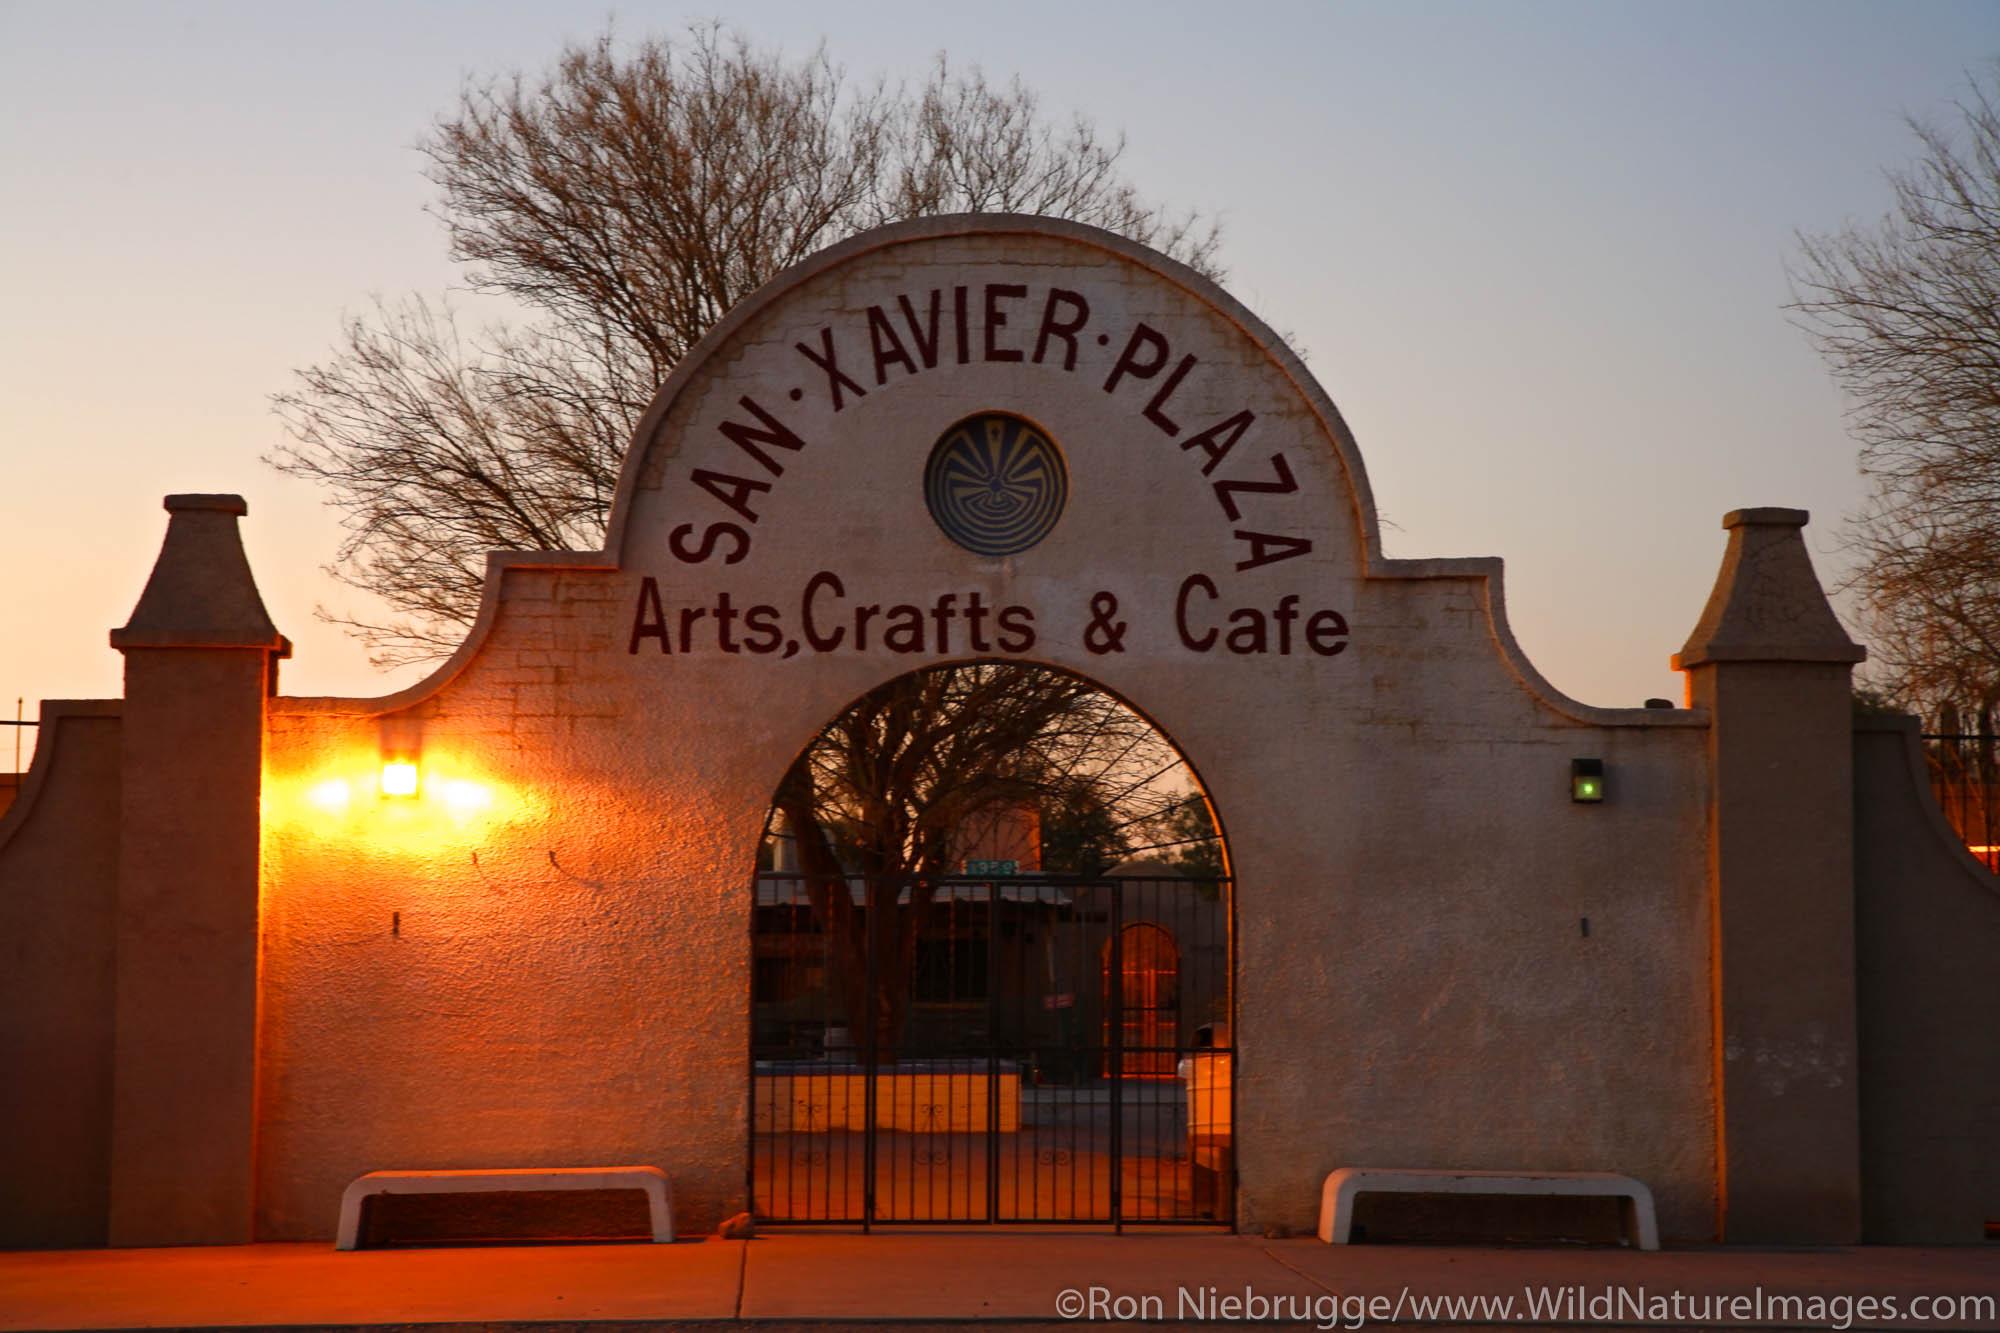 San Xavier Plaza, Tucson, Arizona